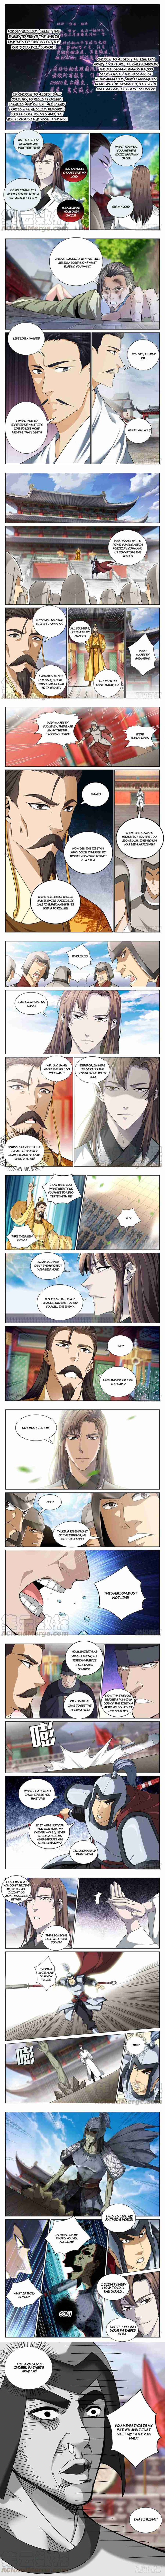 https://manga.mangadogs.com/comics/pic4/29/39645/2326336/532b7cbe070a3579f424988a040752f2.jpg Page 2